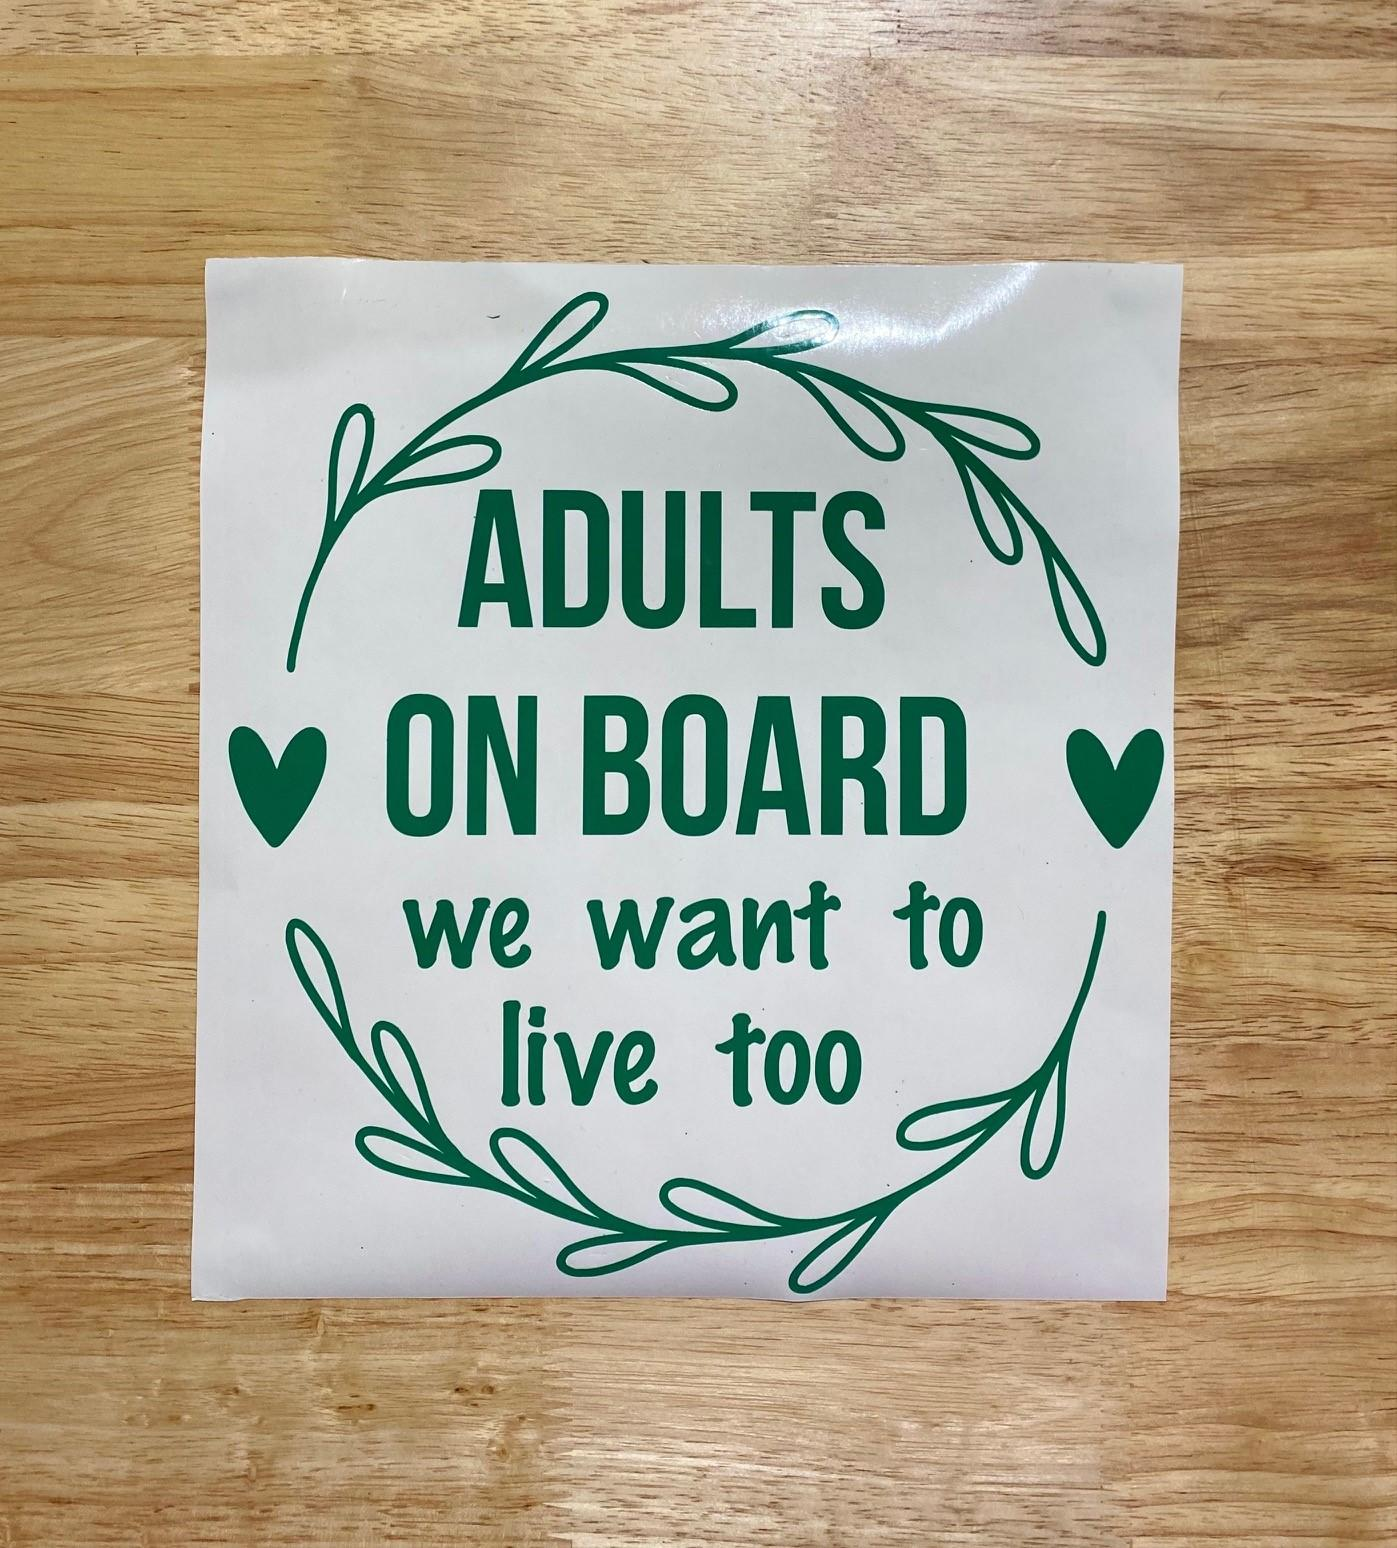 Adults on board car sticker